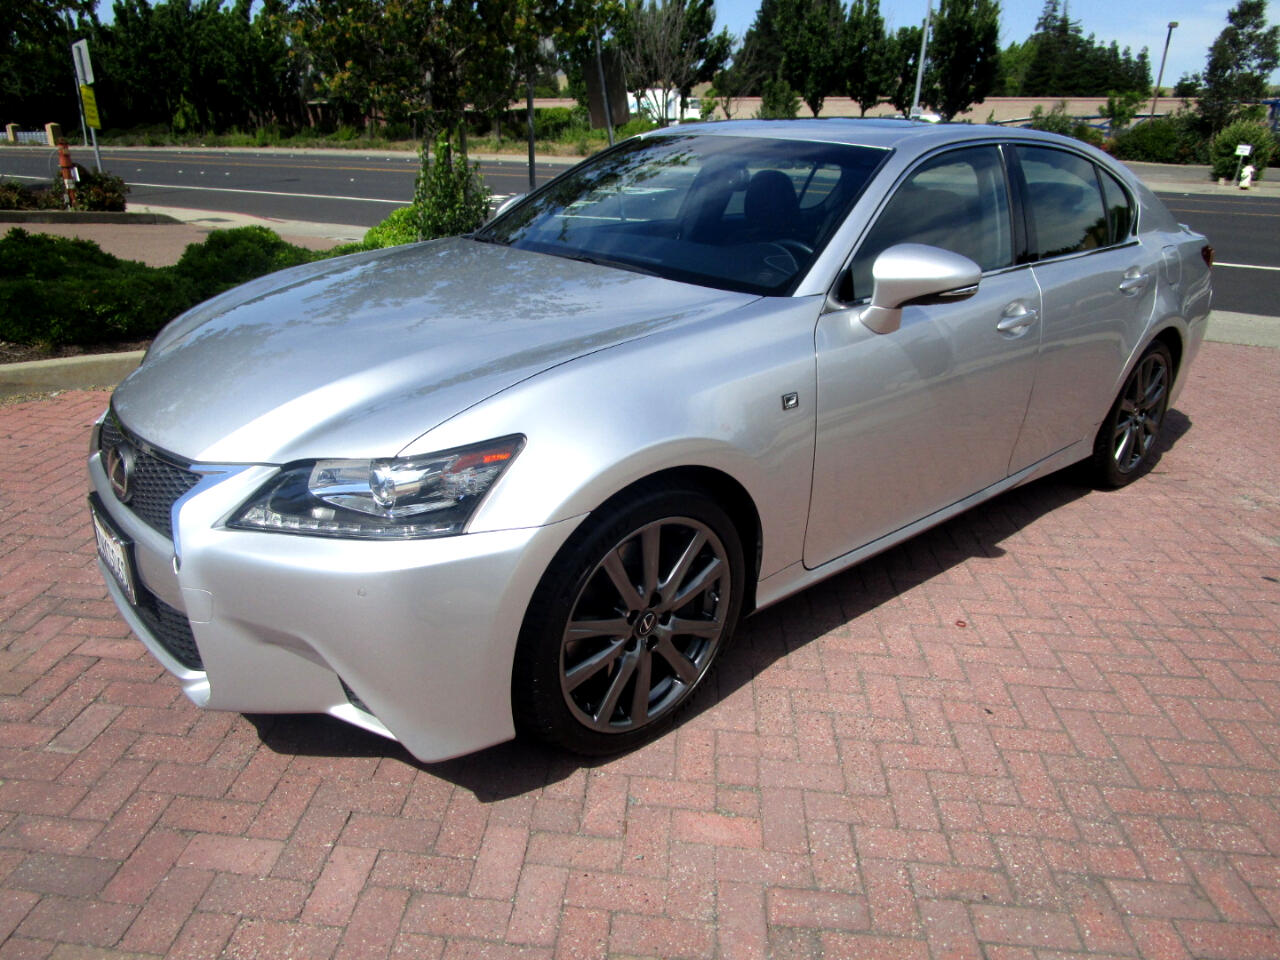 2015 Lexus GS 350 F SPORT**HEAT-AC SEATS**BLIND SPOT**NAV*SAT*CAMERA